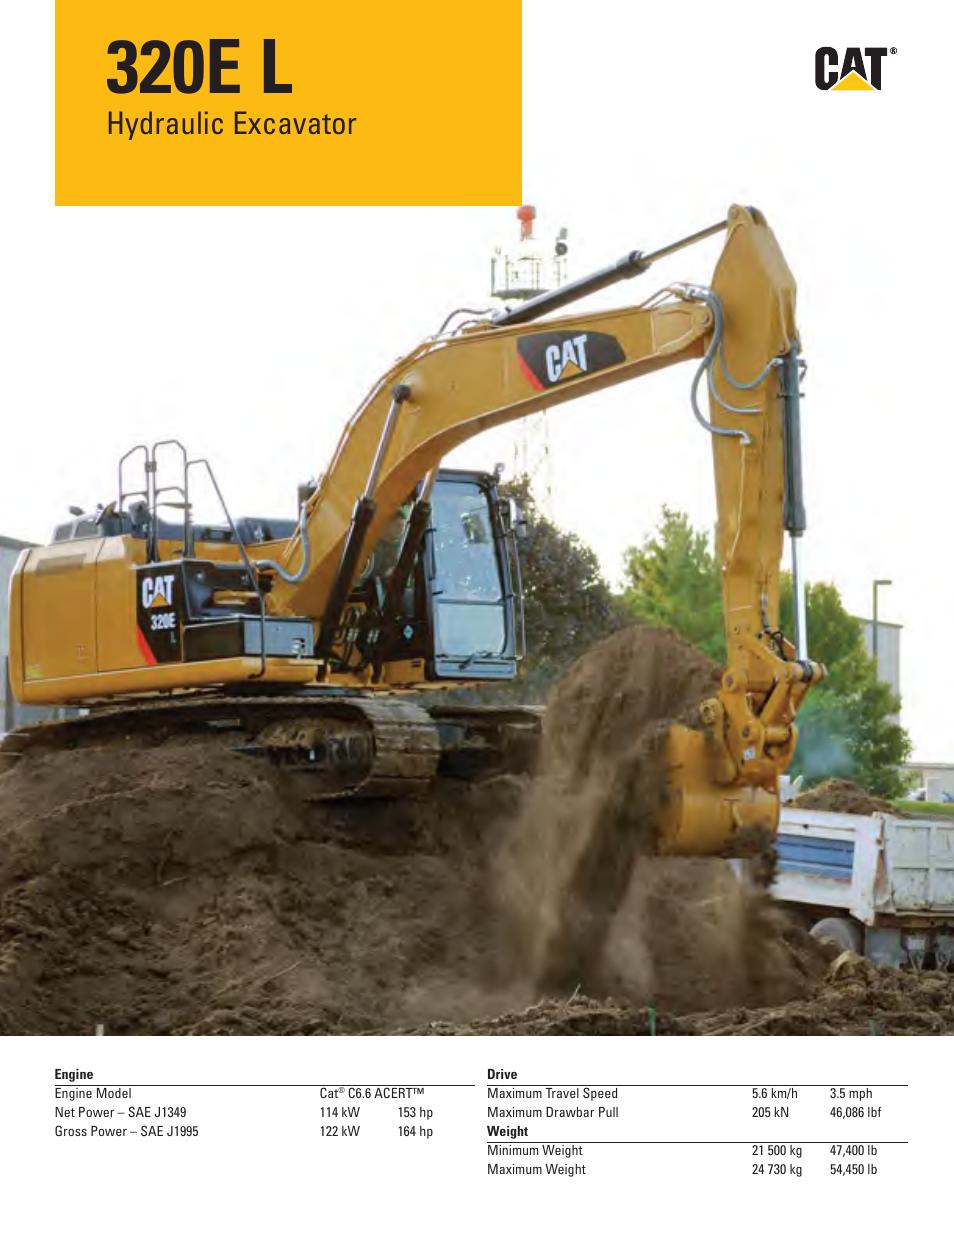 milton cat 320e l user manual 32 pages rh manualsdir com Caterpillar 420E Caterpillar Equipment